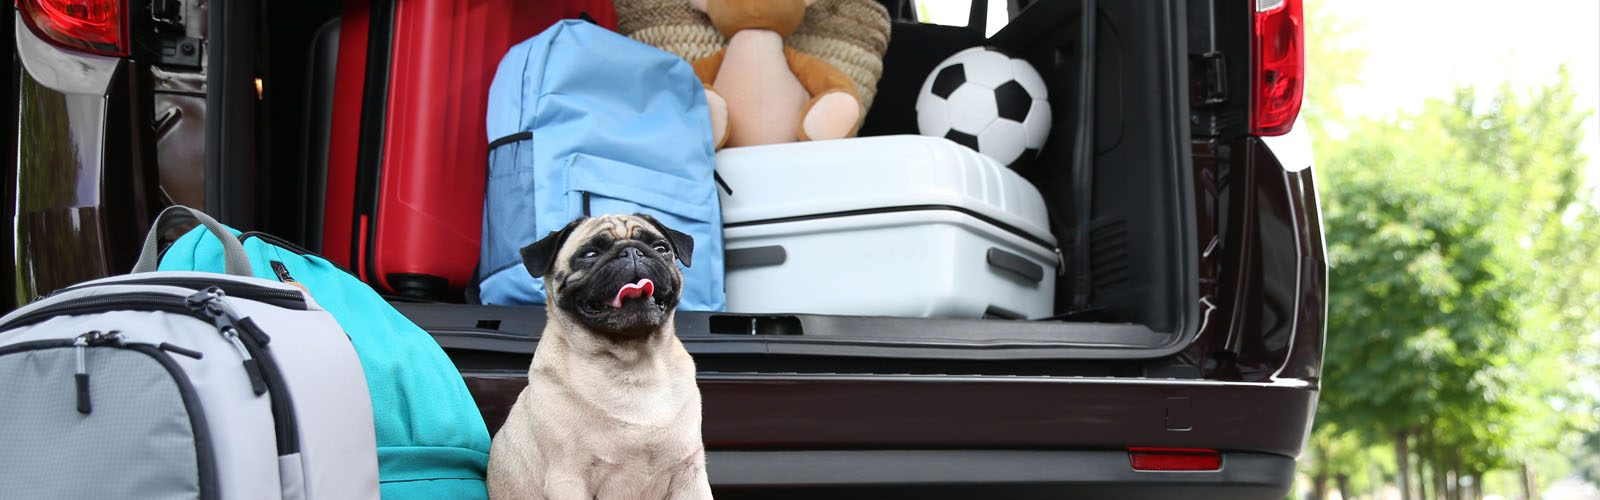 Luxury dog friendly cottages